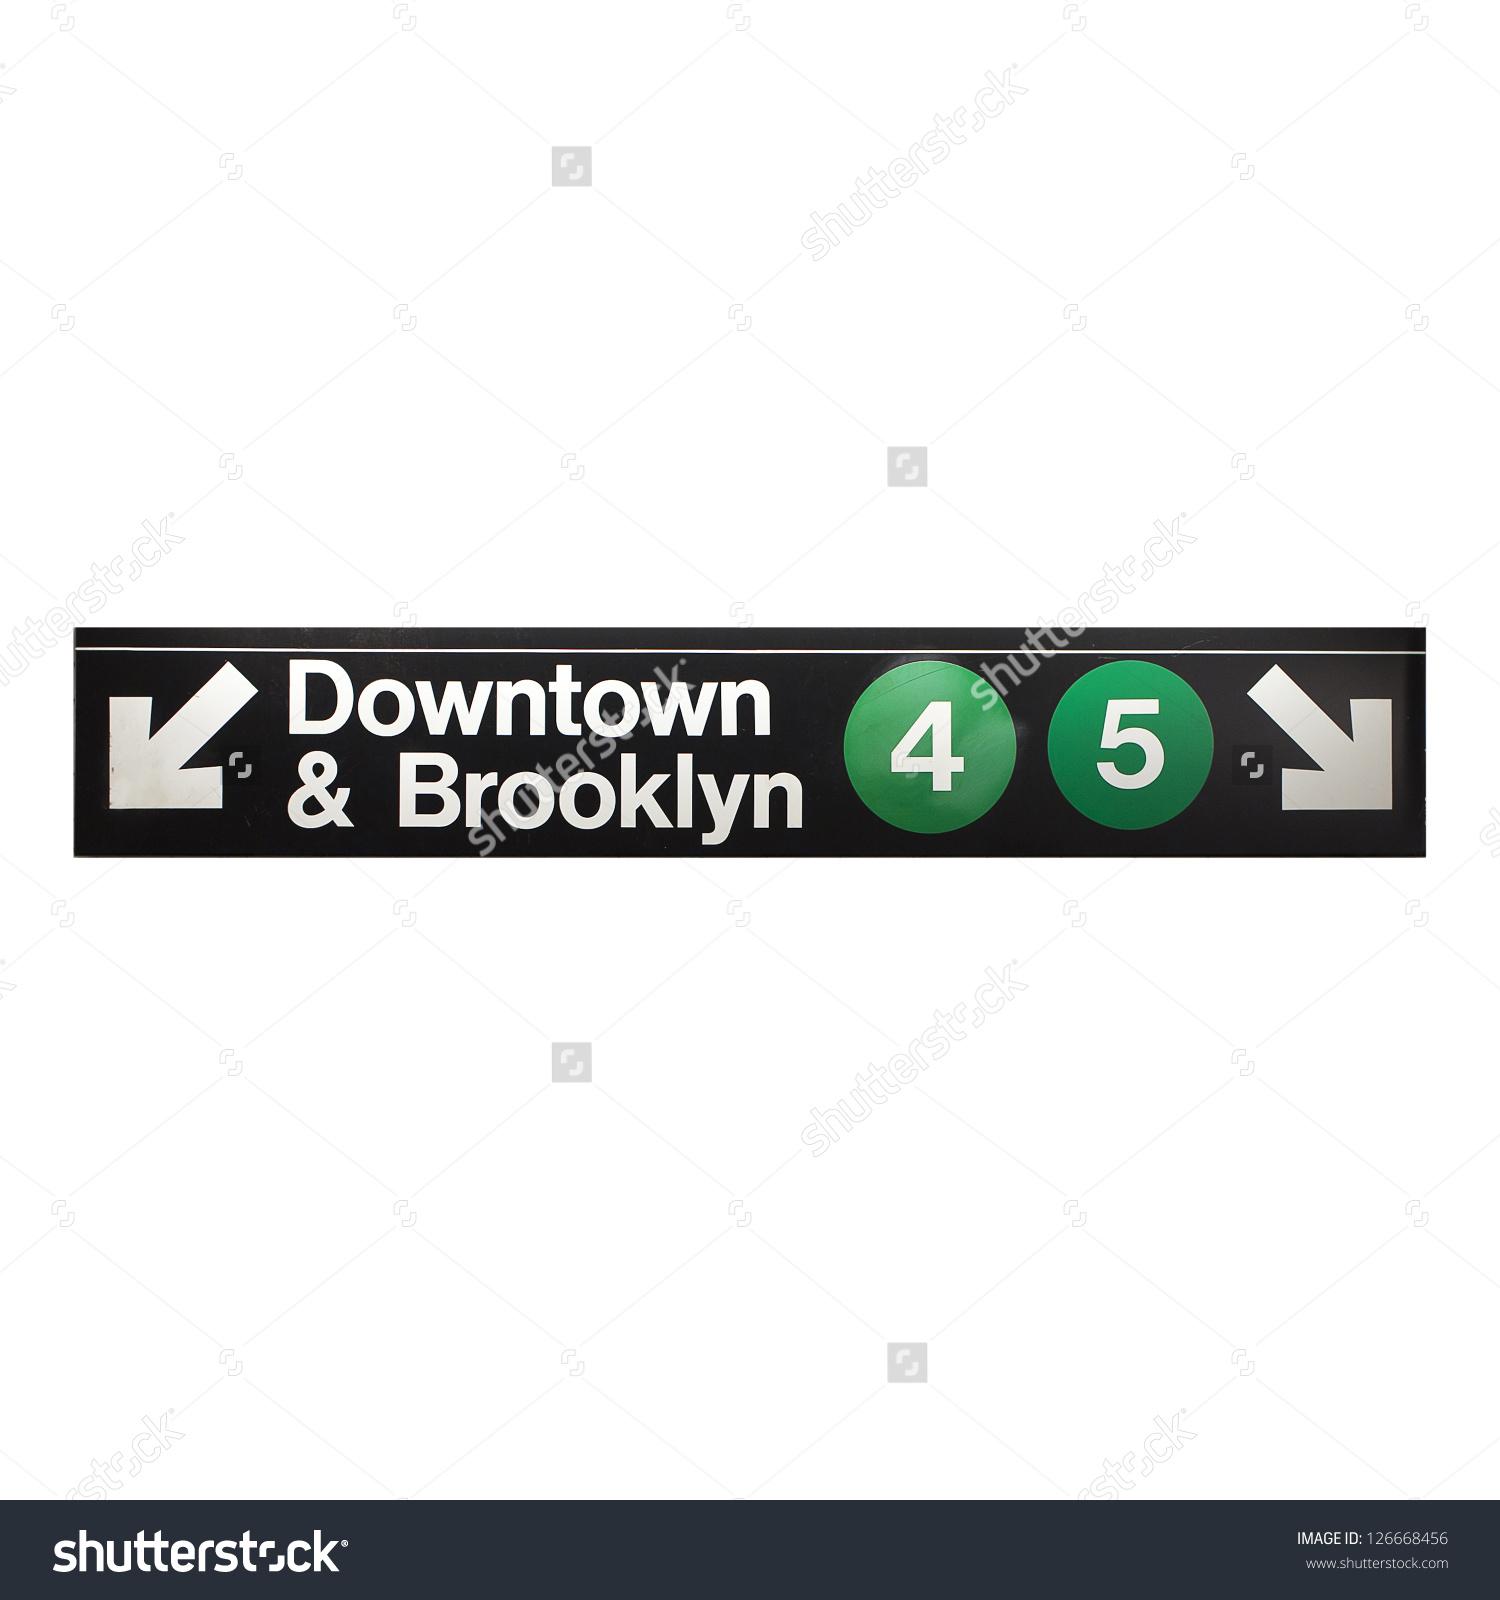 New York City Subway Sign Midtown Stock Photo 126668456.